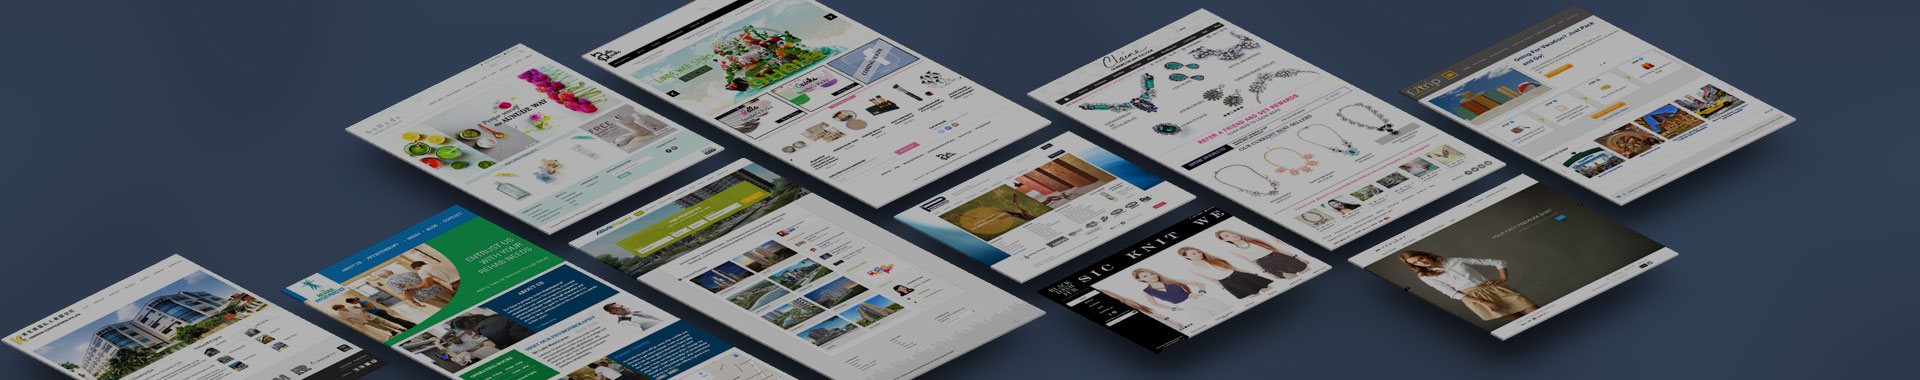 Website Design Singapore - Each-A-Cup